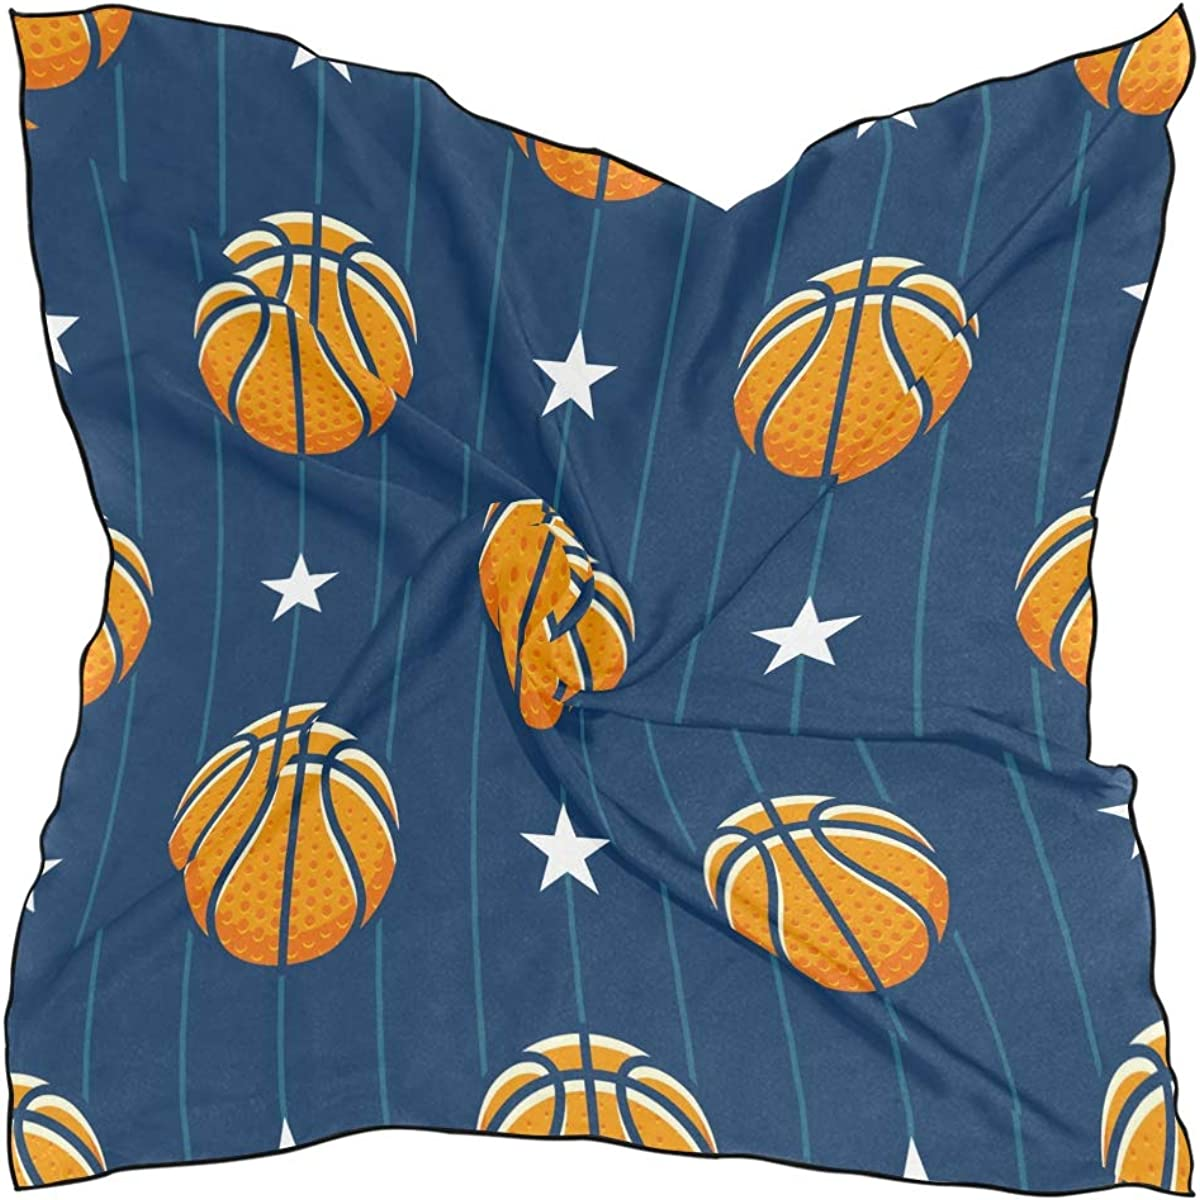 XLING Fashion Square Scarf Sport Basketball Stripe Star Lightweight Sunscreen Scarves Muffler Hair Wrap Headscarf Neckerchief for Women Men